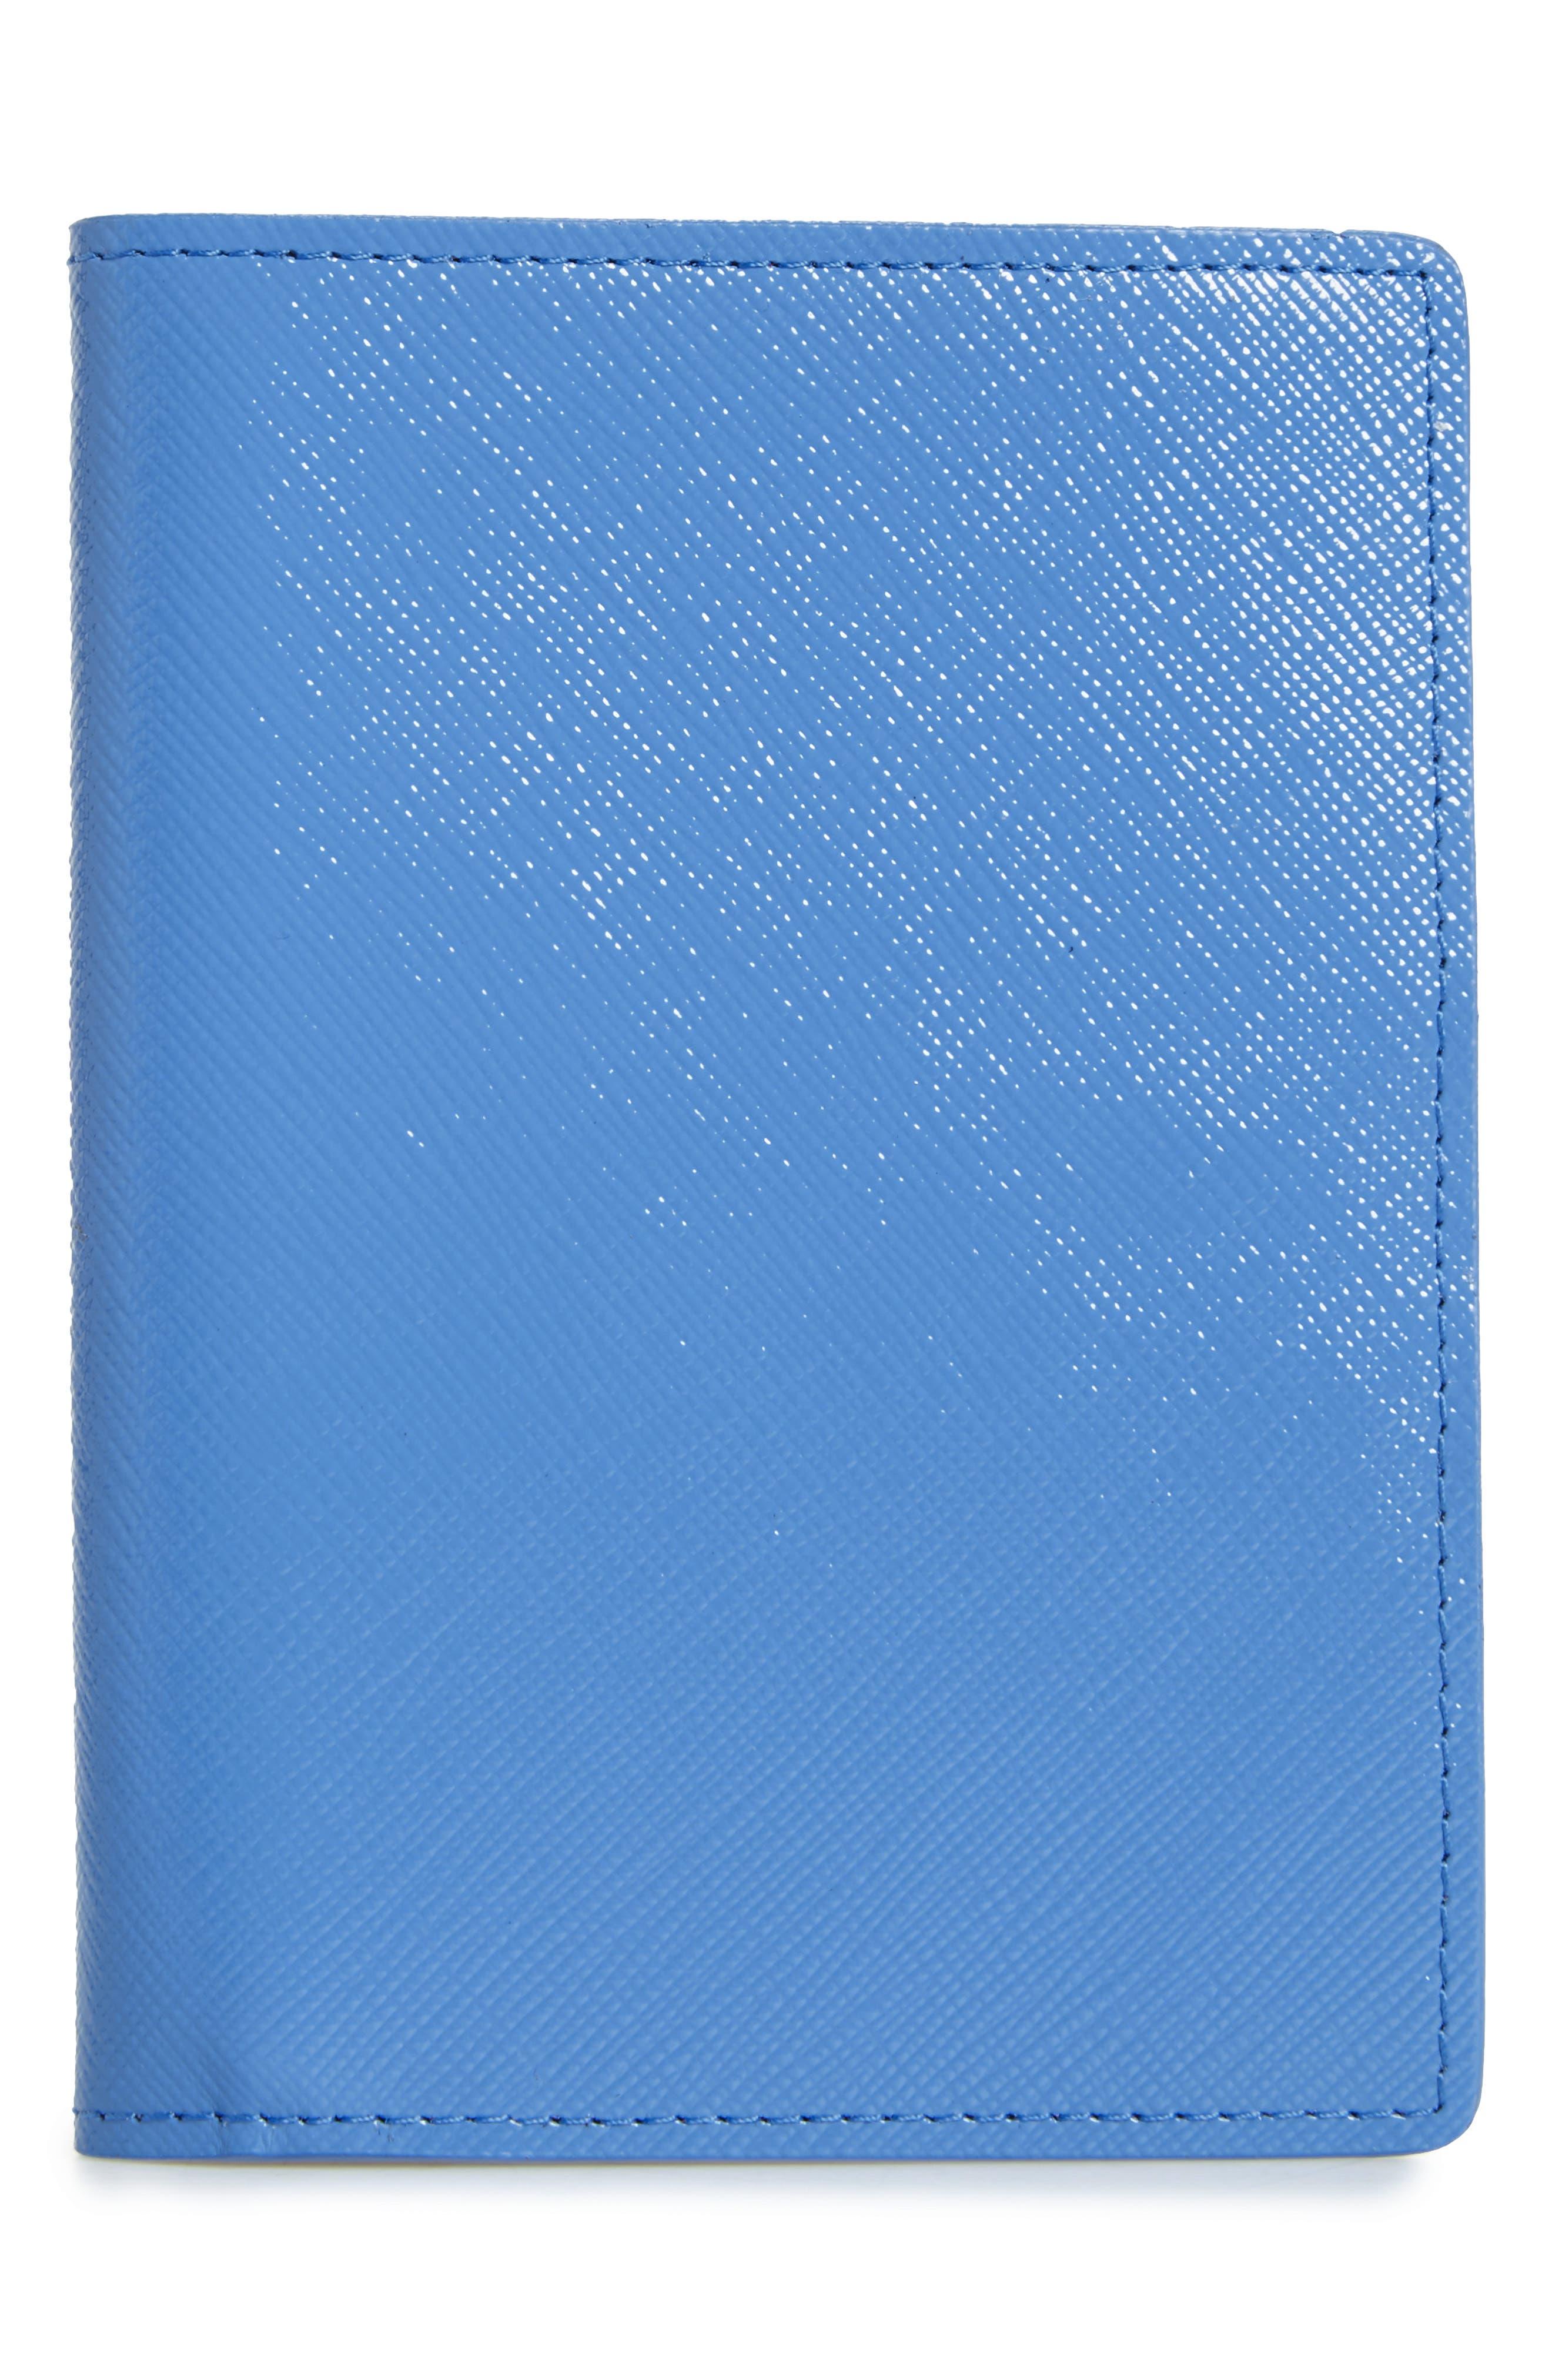 Nordstrom Leather Passport Case